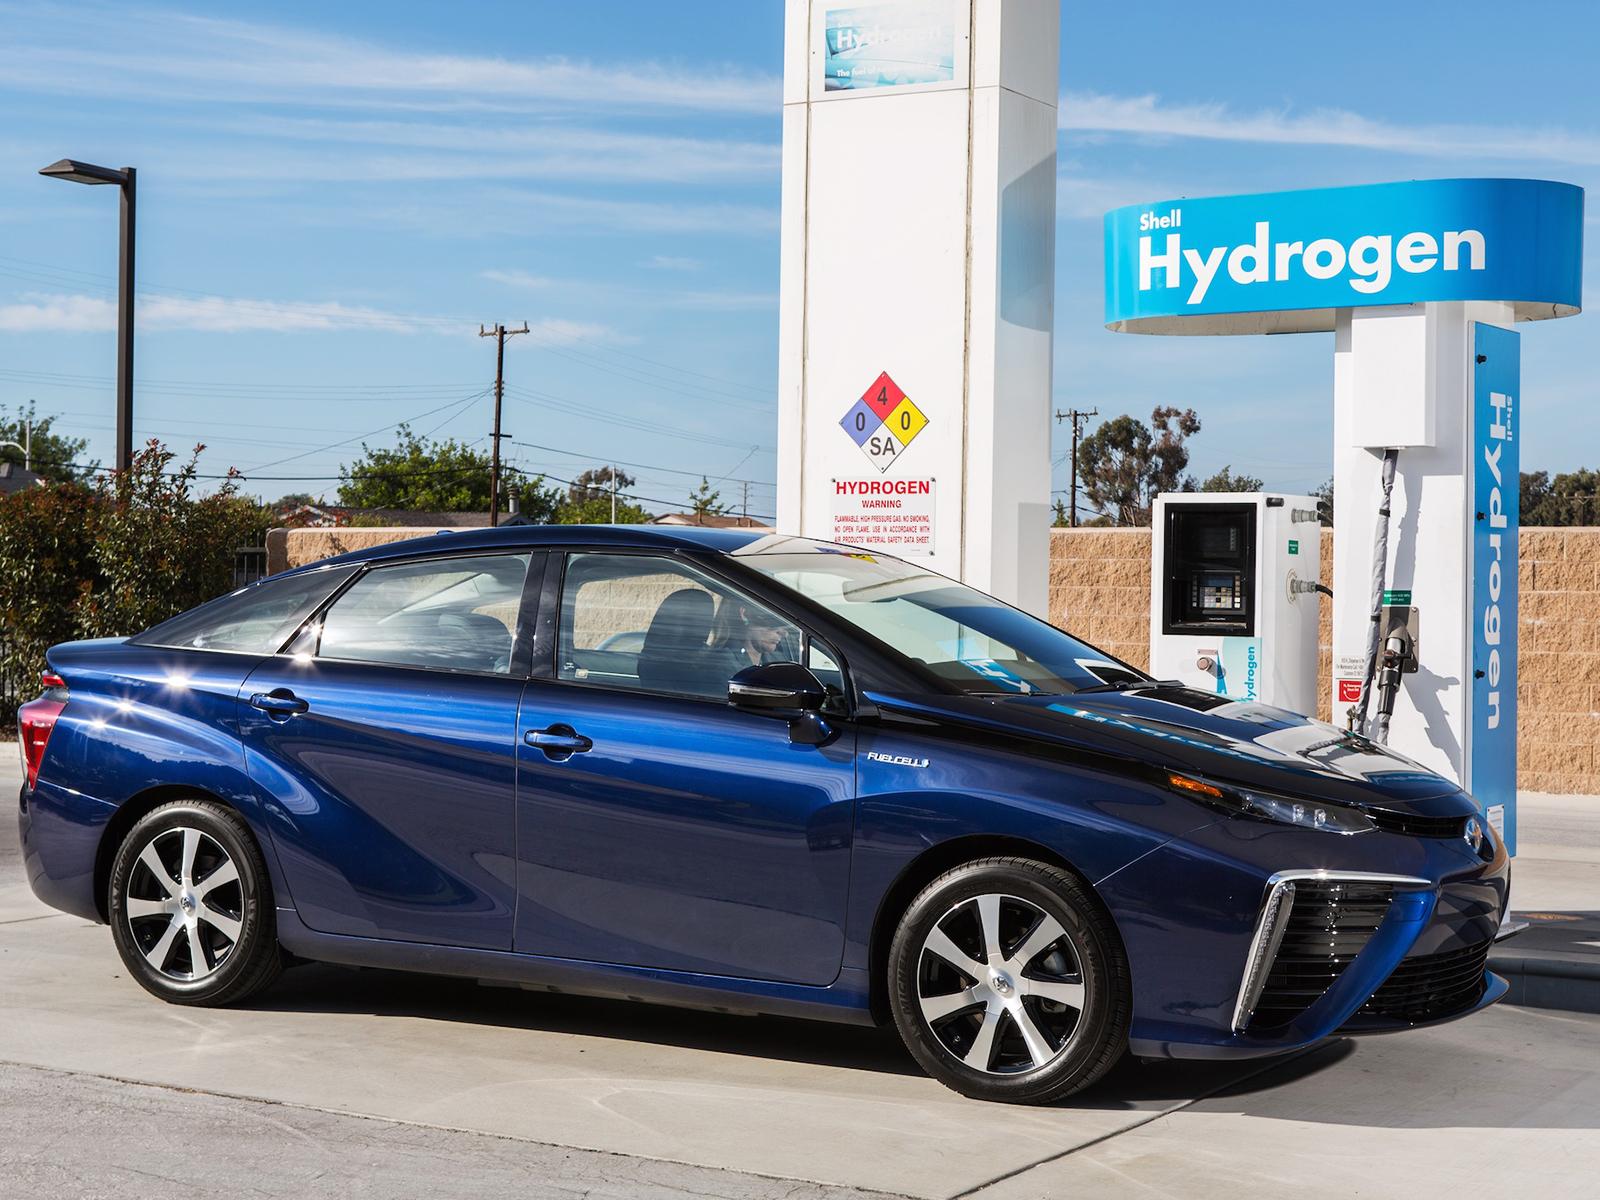 vehiculo-hidrogeno